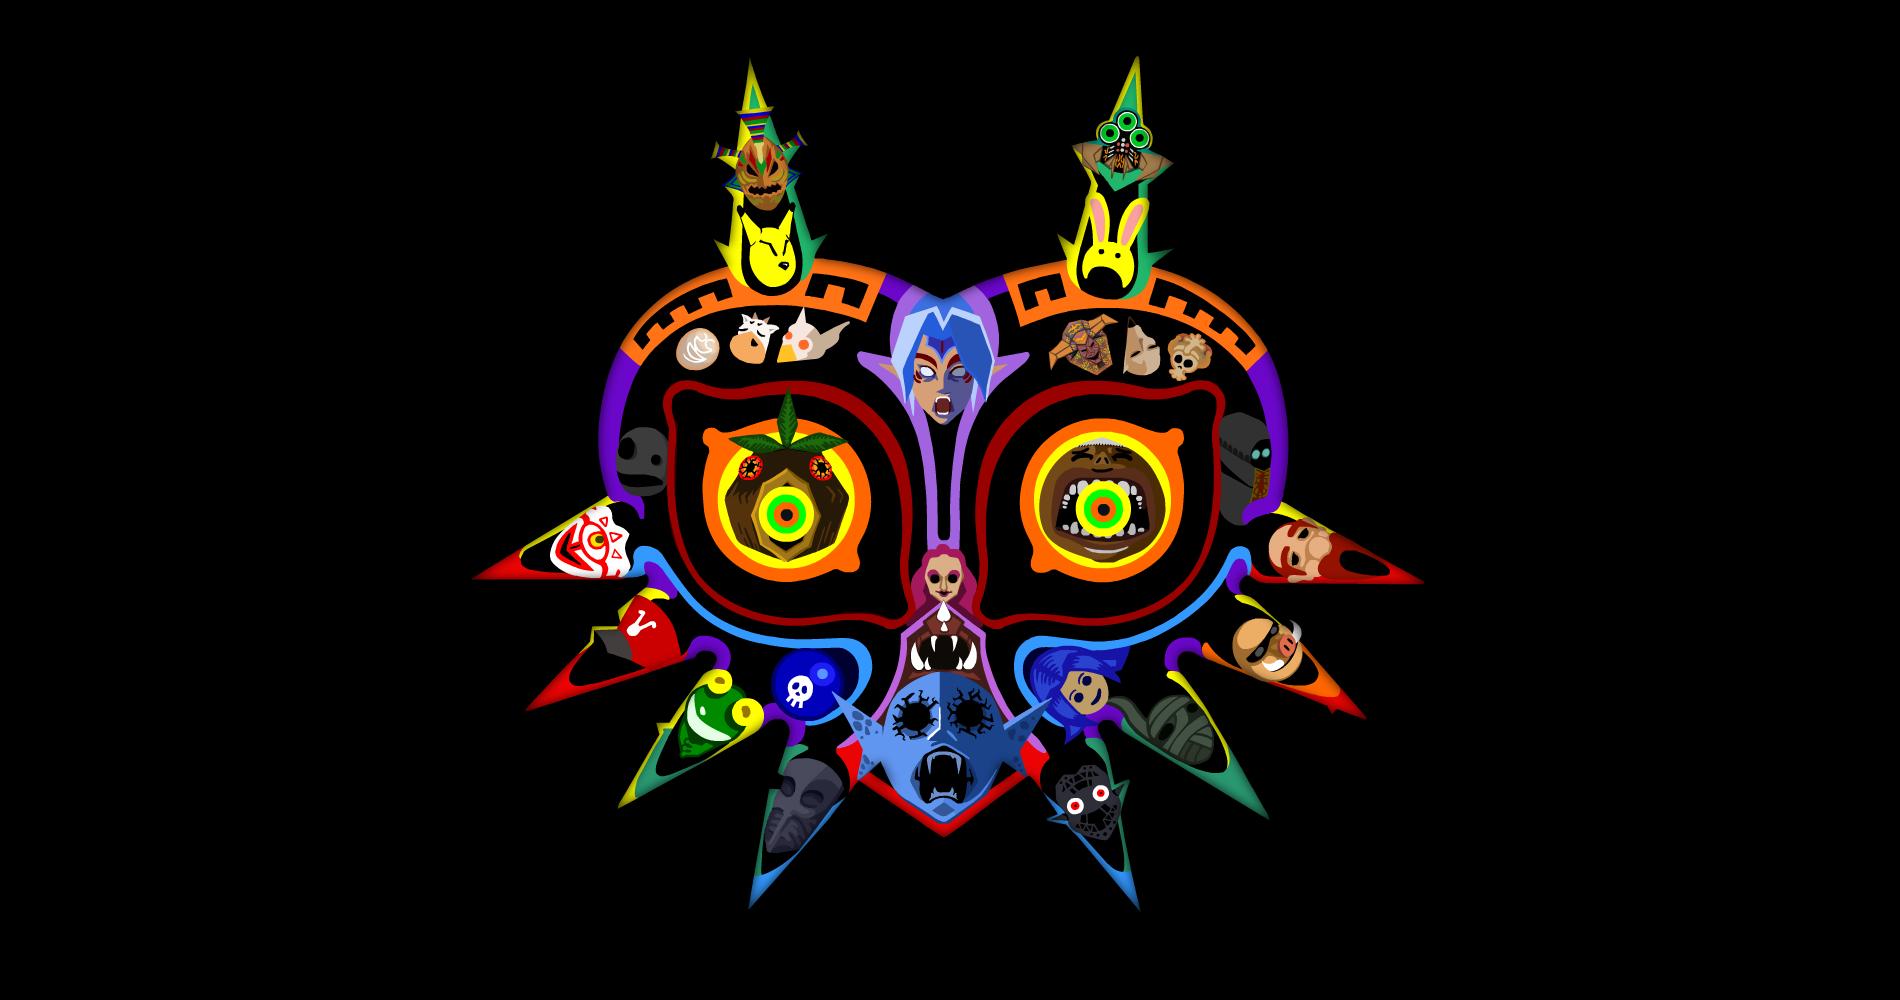 Majora S Mask Wallpaper Featuring All The Masks Legendofzelda